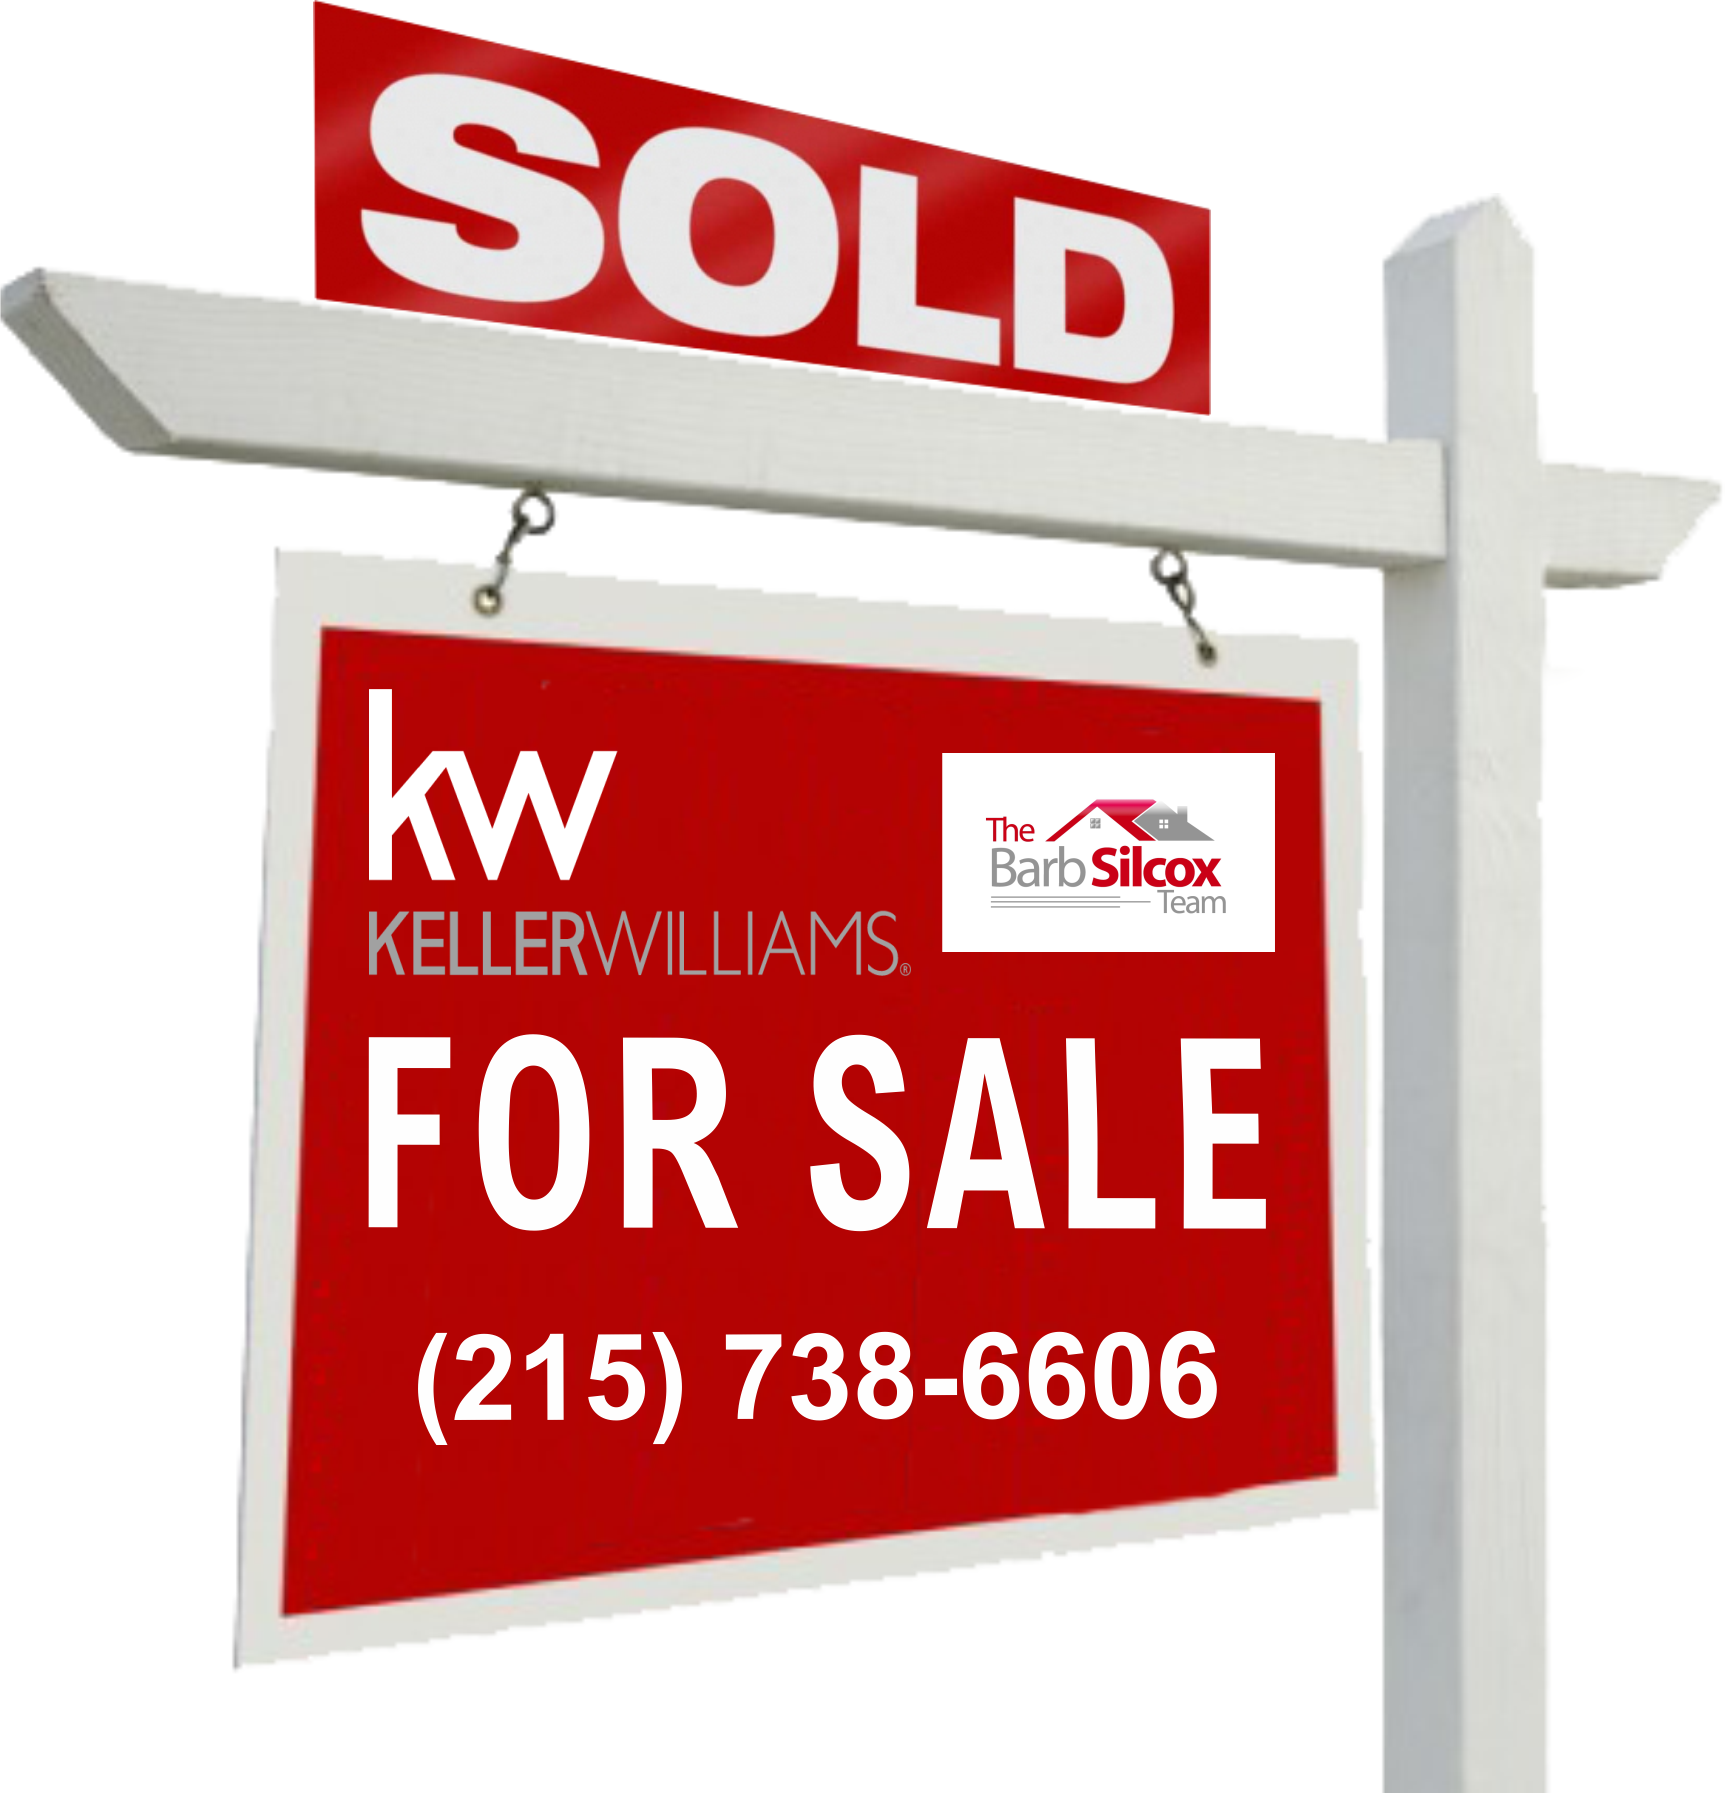 Keller Williams Sold Sign